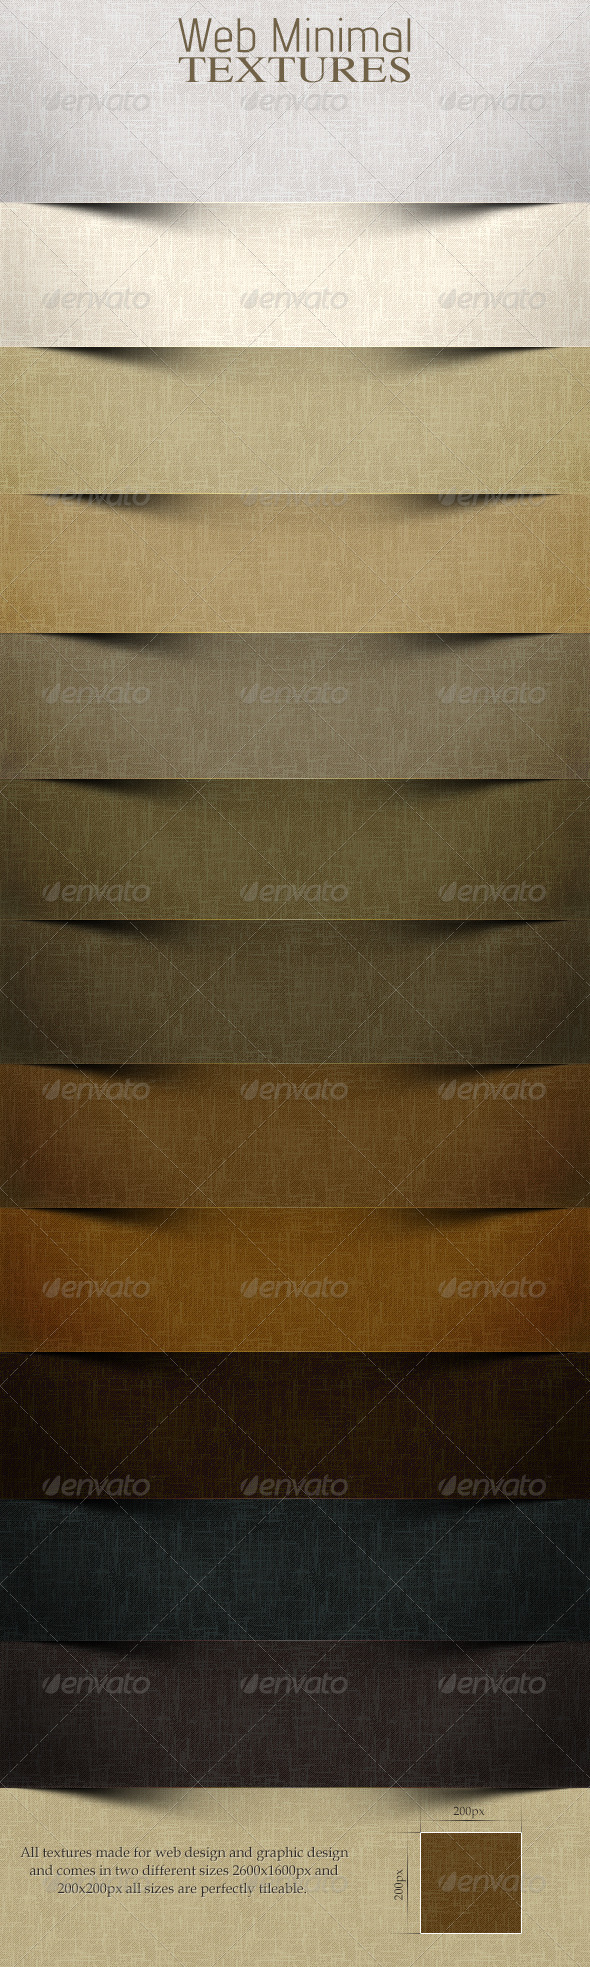 GraphicRiver Web Minimal Textures 2.0 3413582